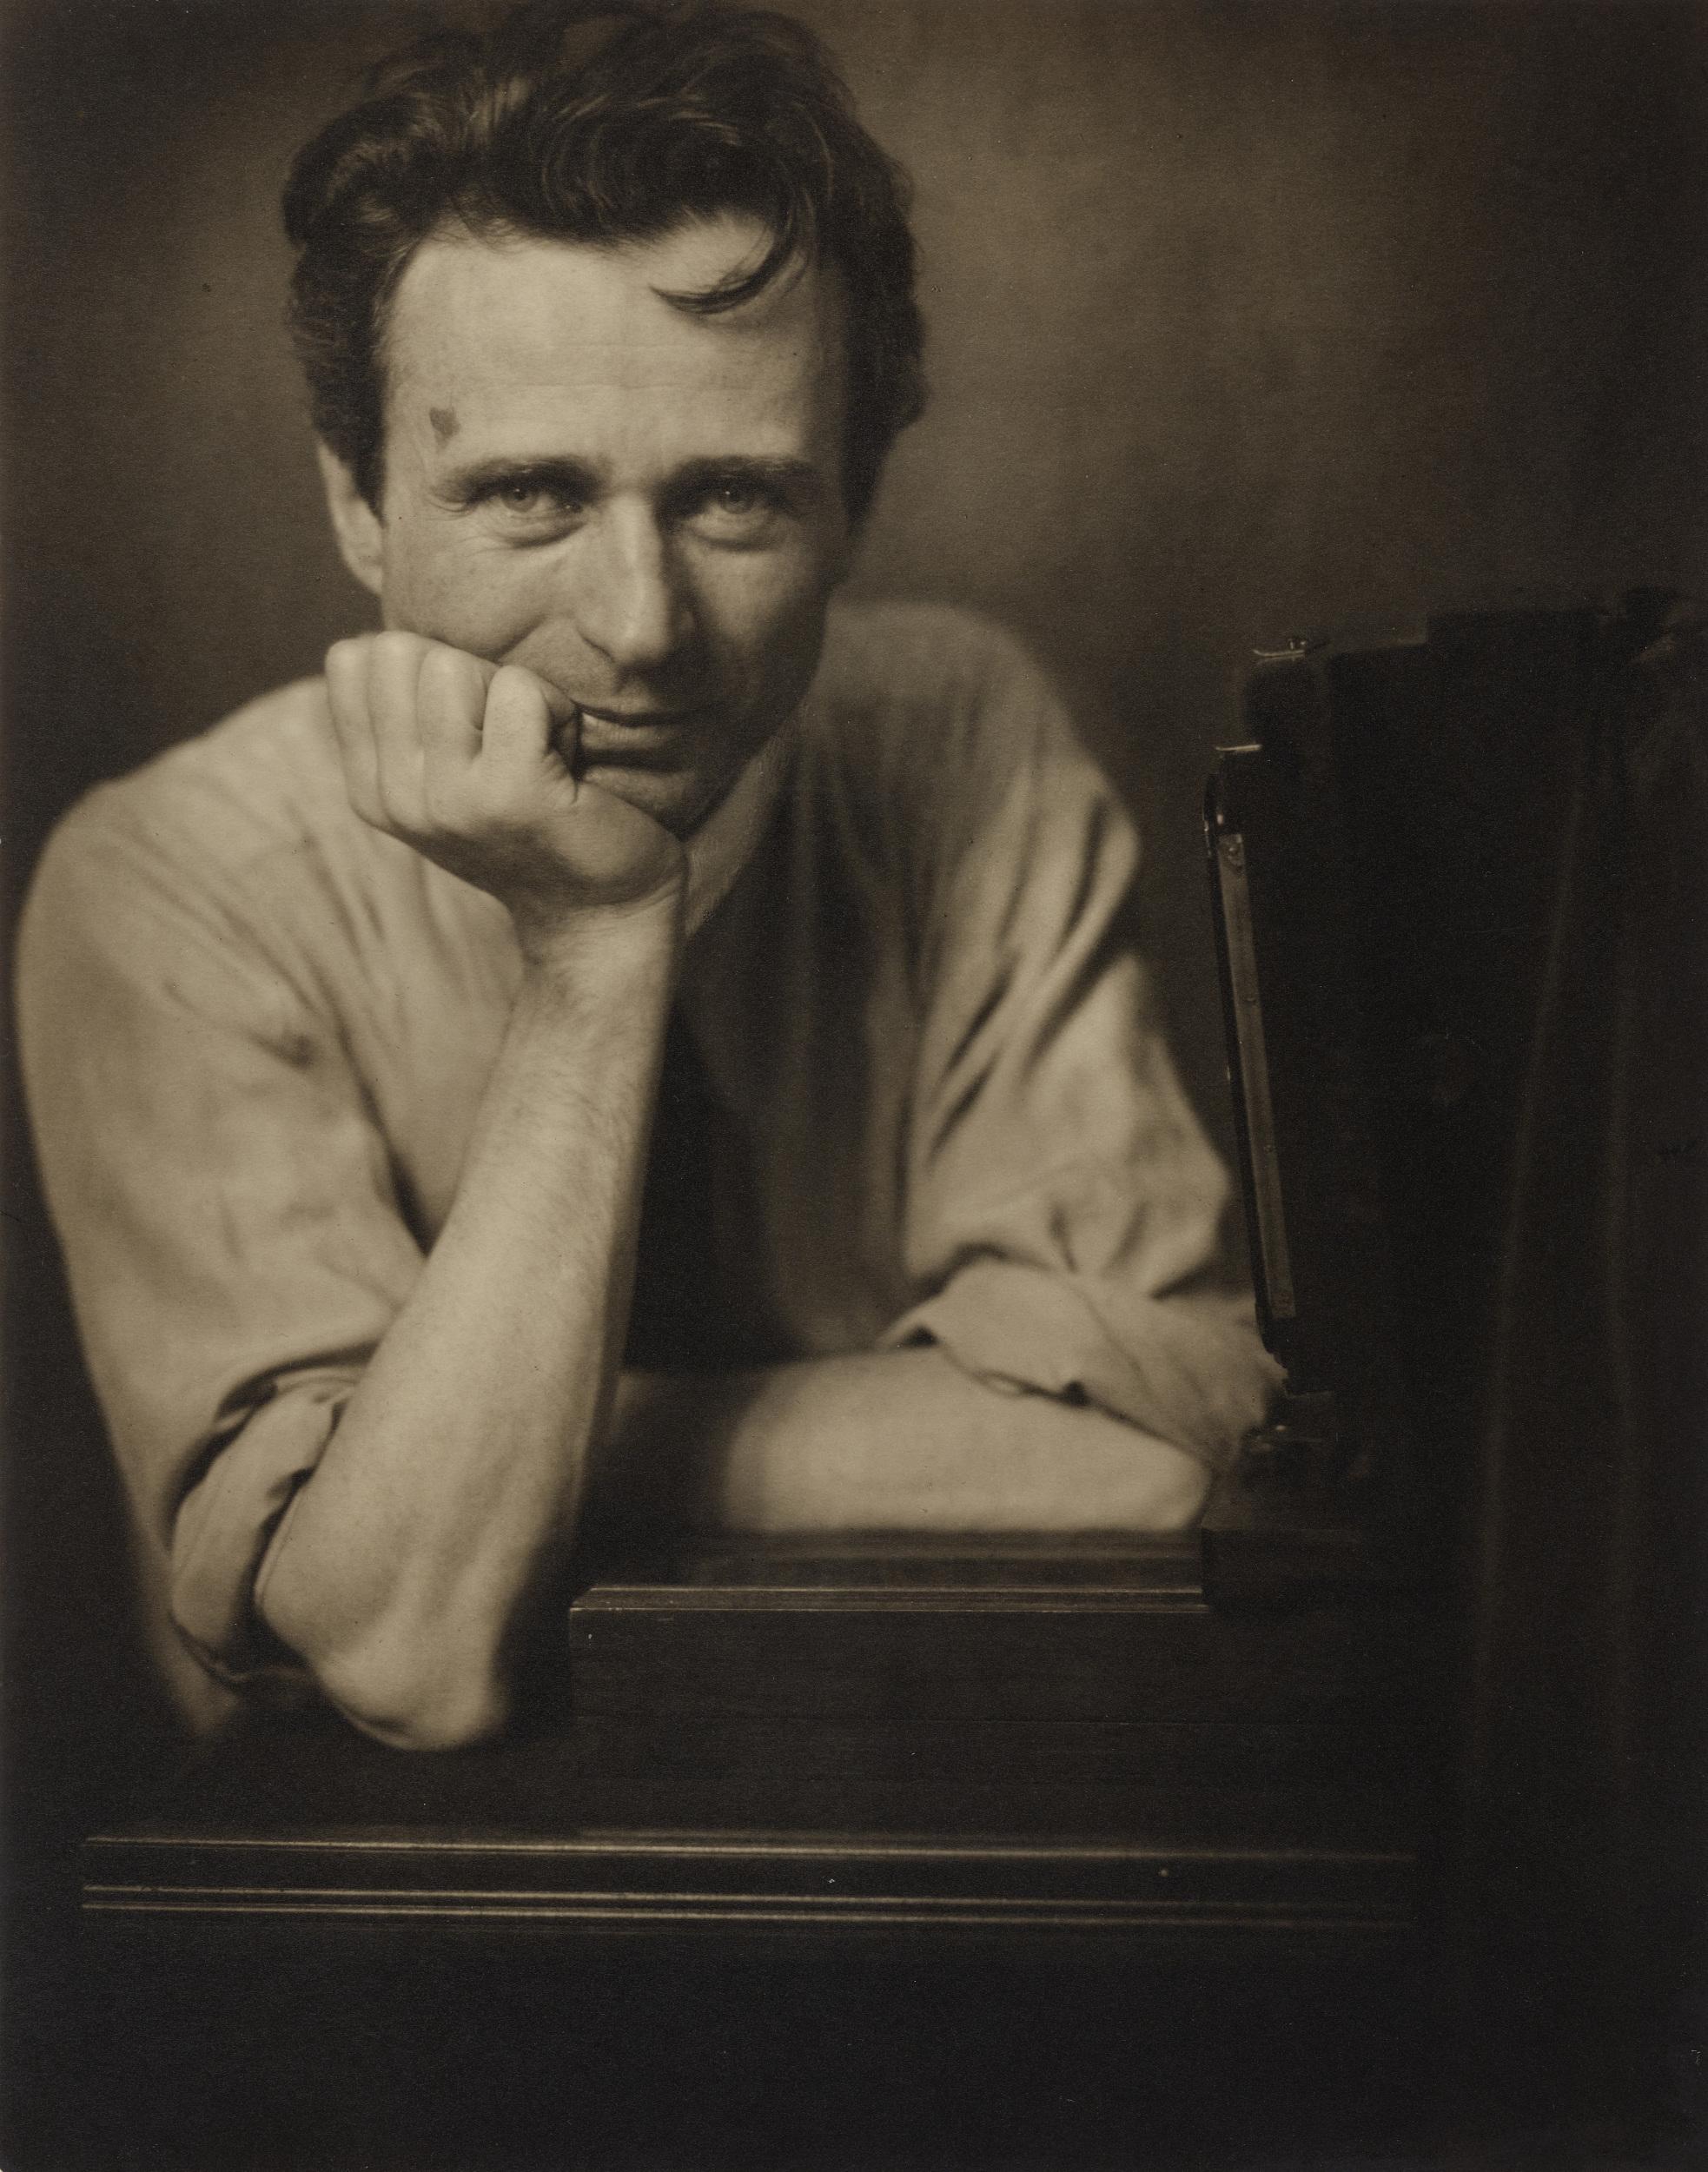 Self Portrait of photographer Edward Steichen, from 1917